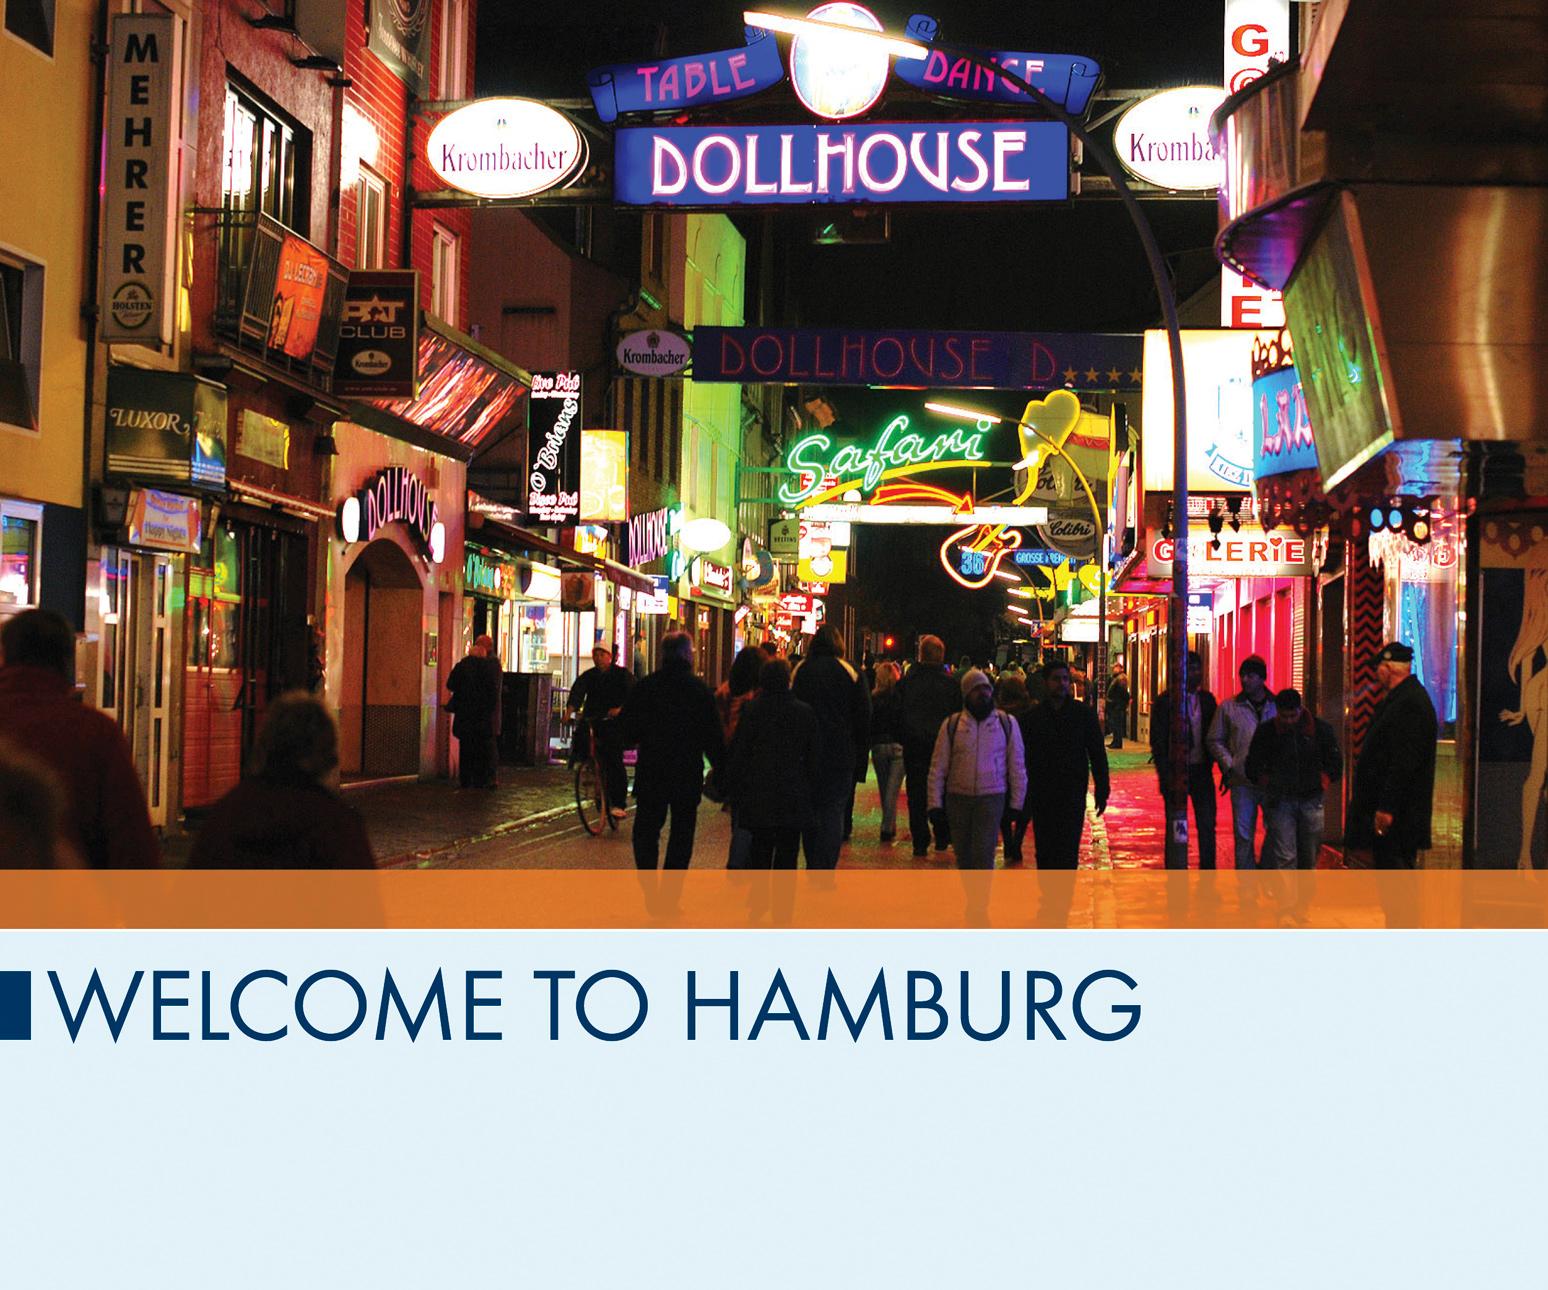 Gnosa Hamburg hamburg fodor s germany fodor s